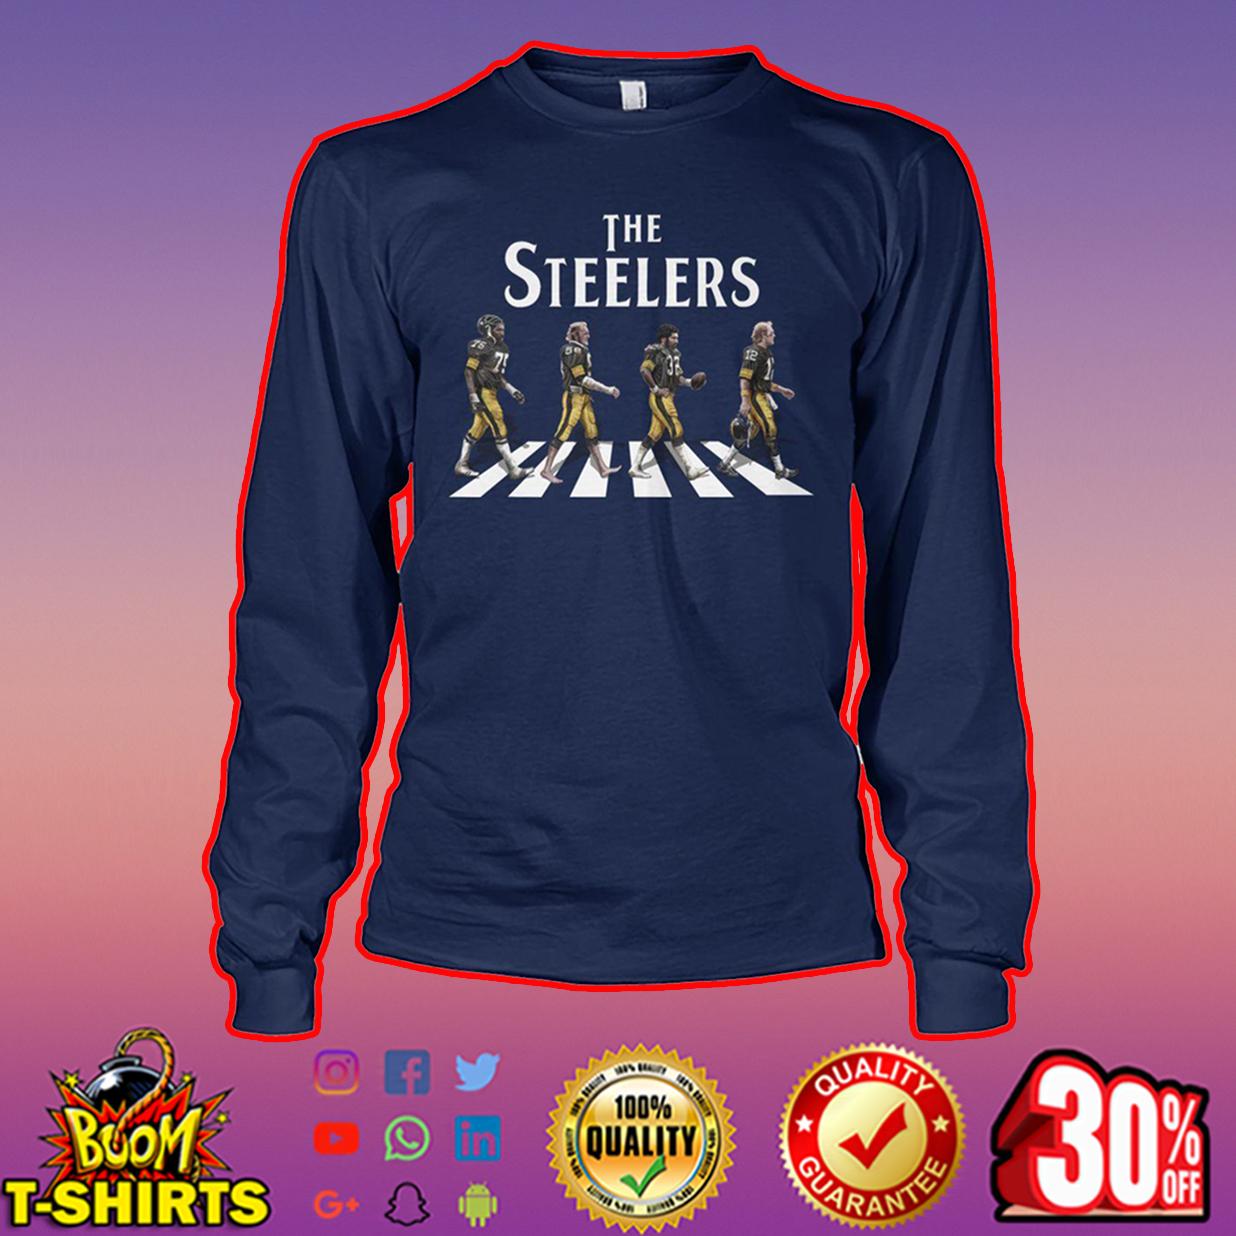 The Steelers abbey road long sleeve